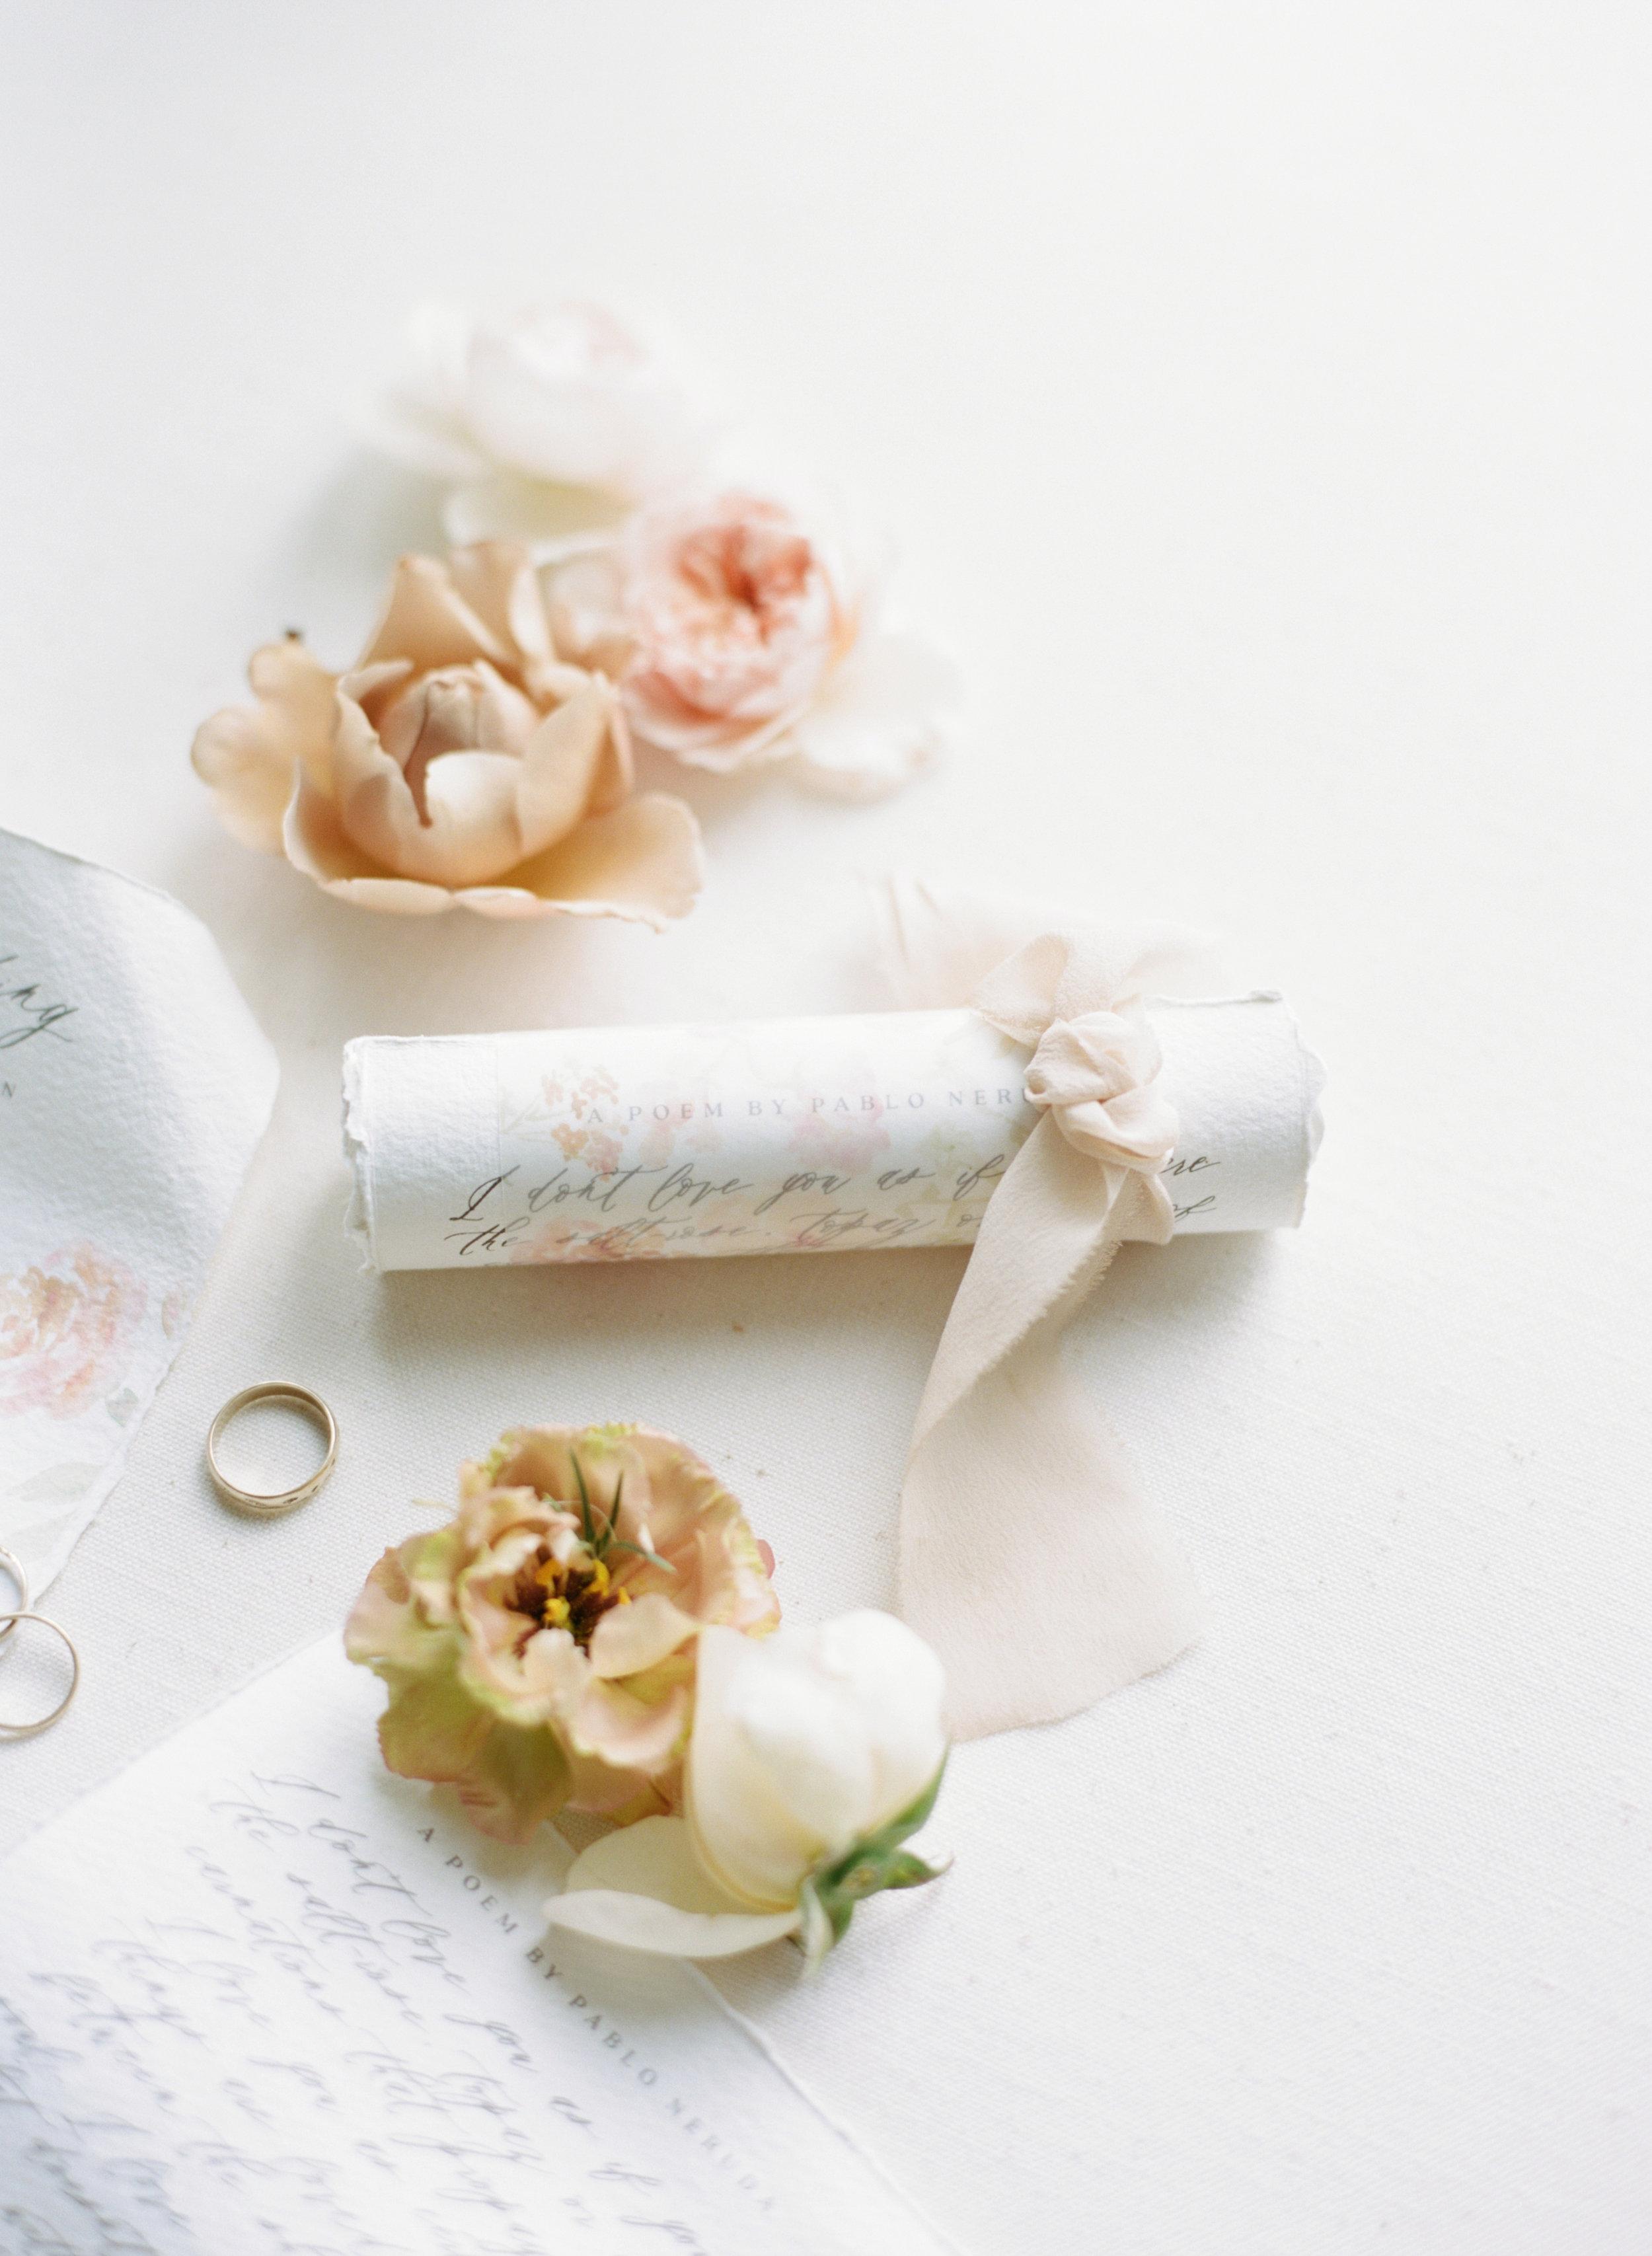 alexandra-meseke-understated-soft-luxury-wedding-upstate-ny_0025.jpg